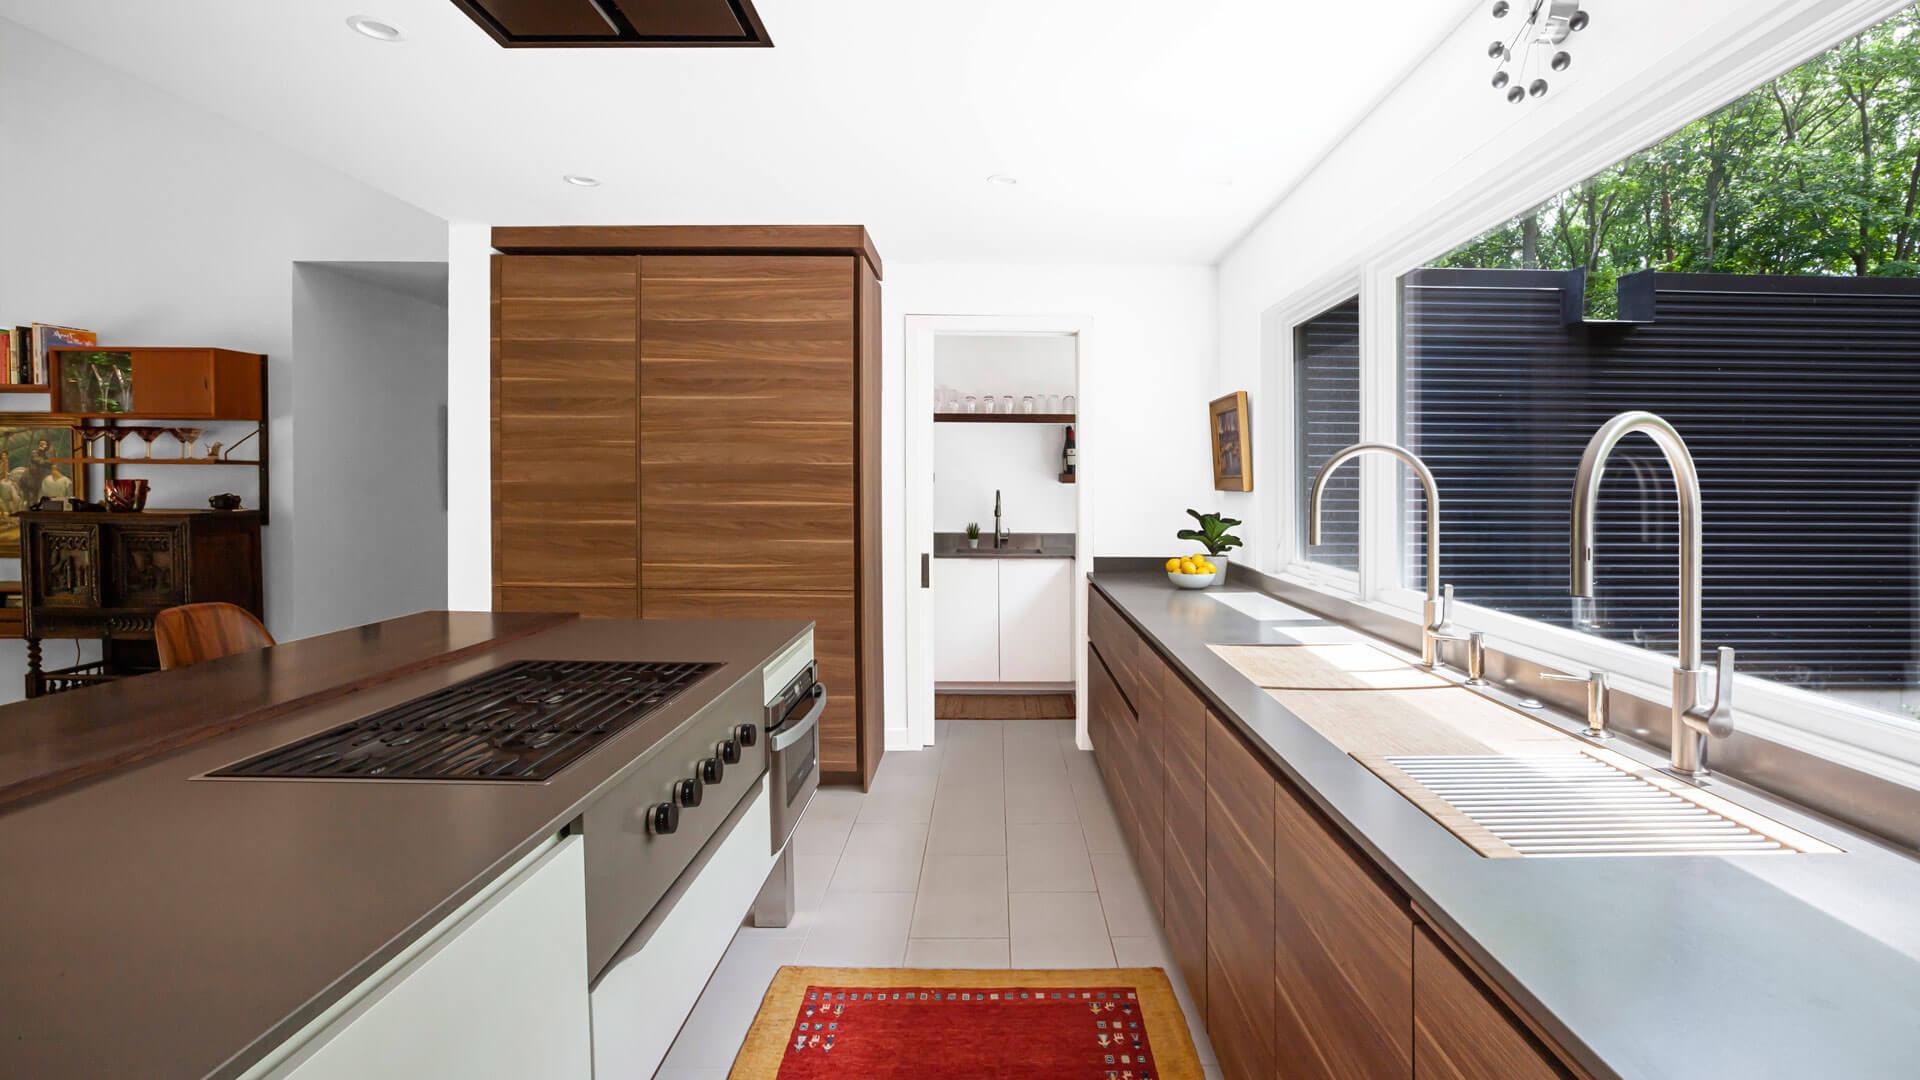 Modern Kitchen with view into Pantry - Bridge House - Fenneville, Michigan - Lake Michigan